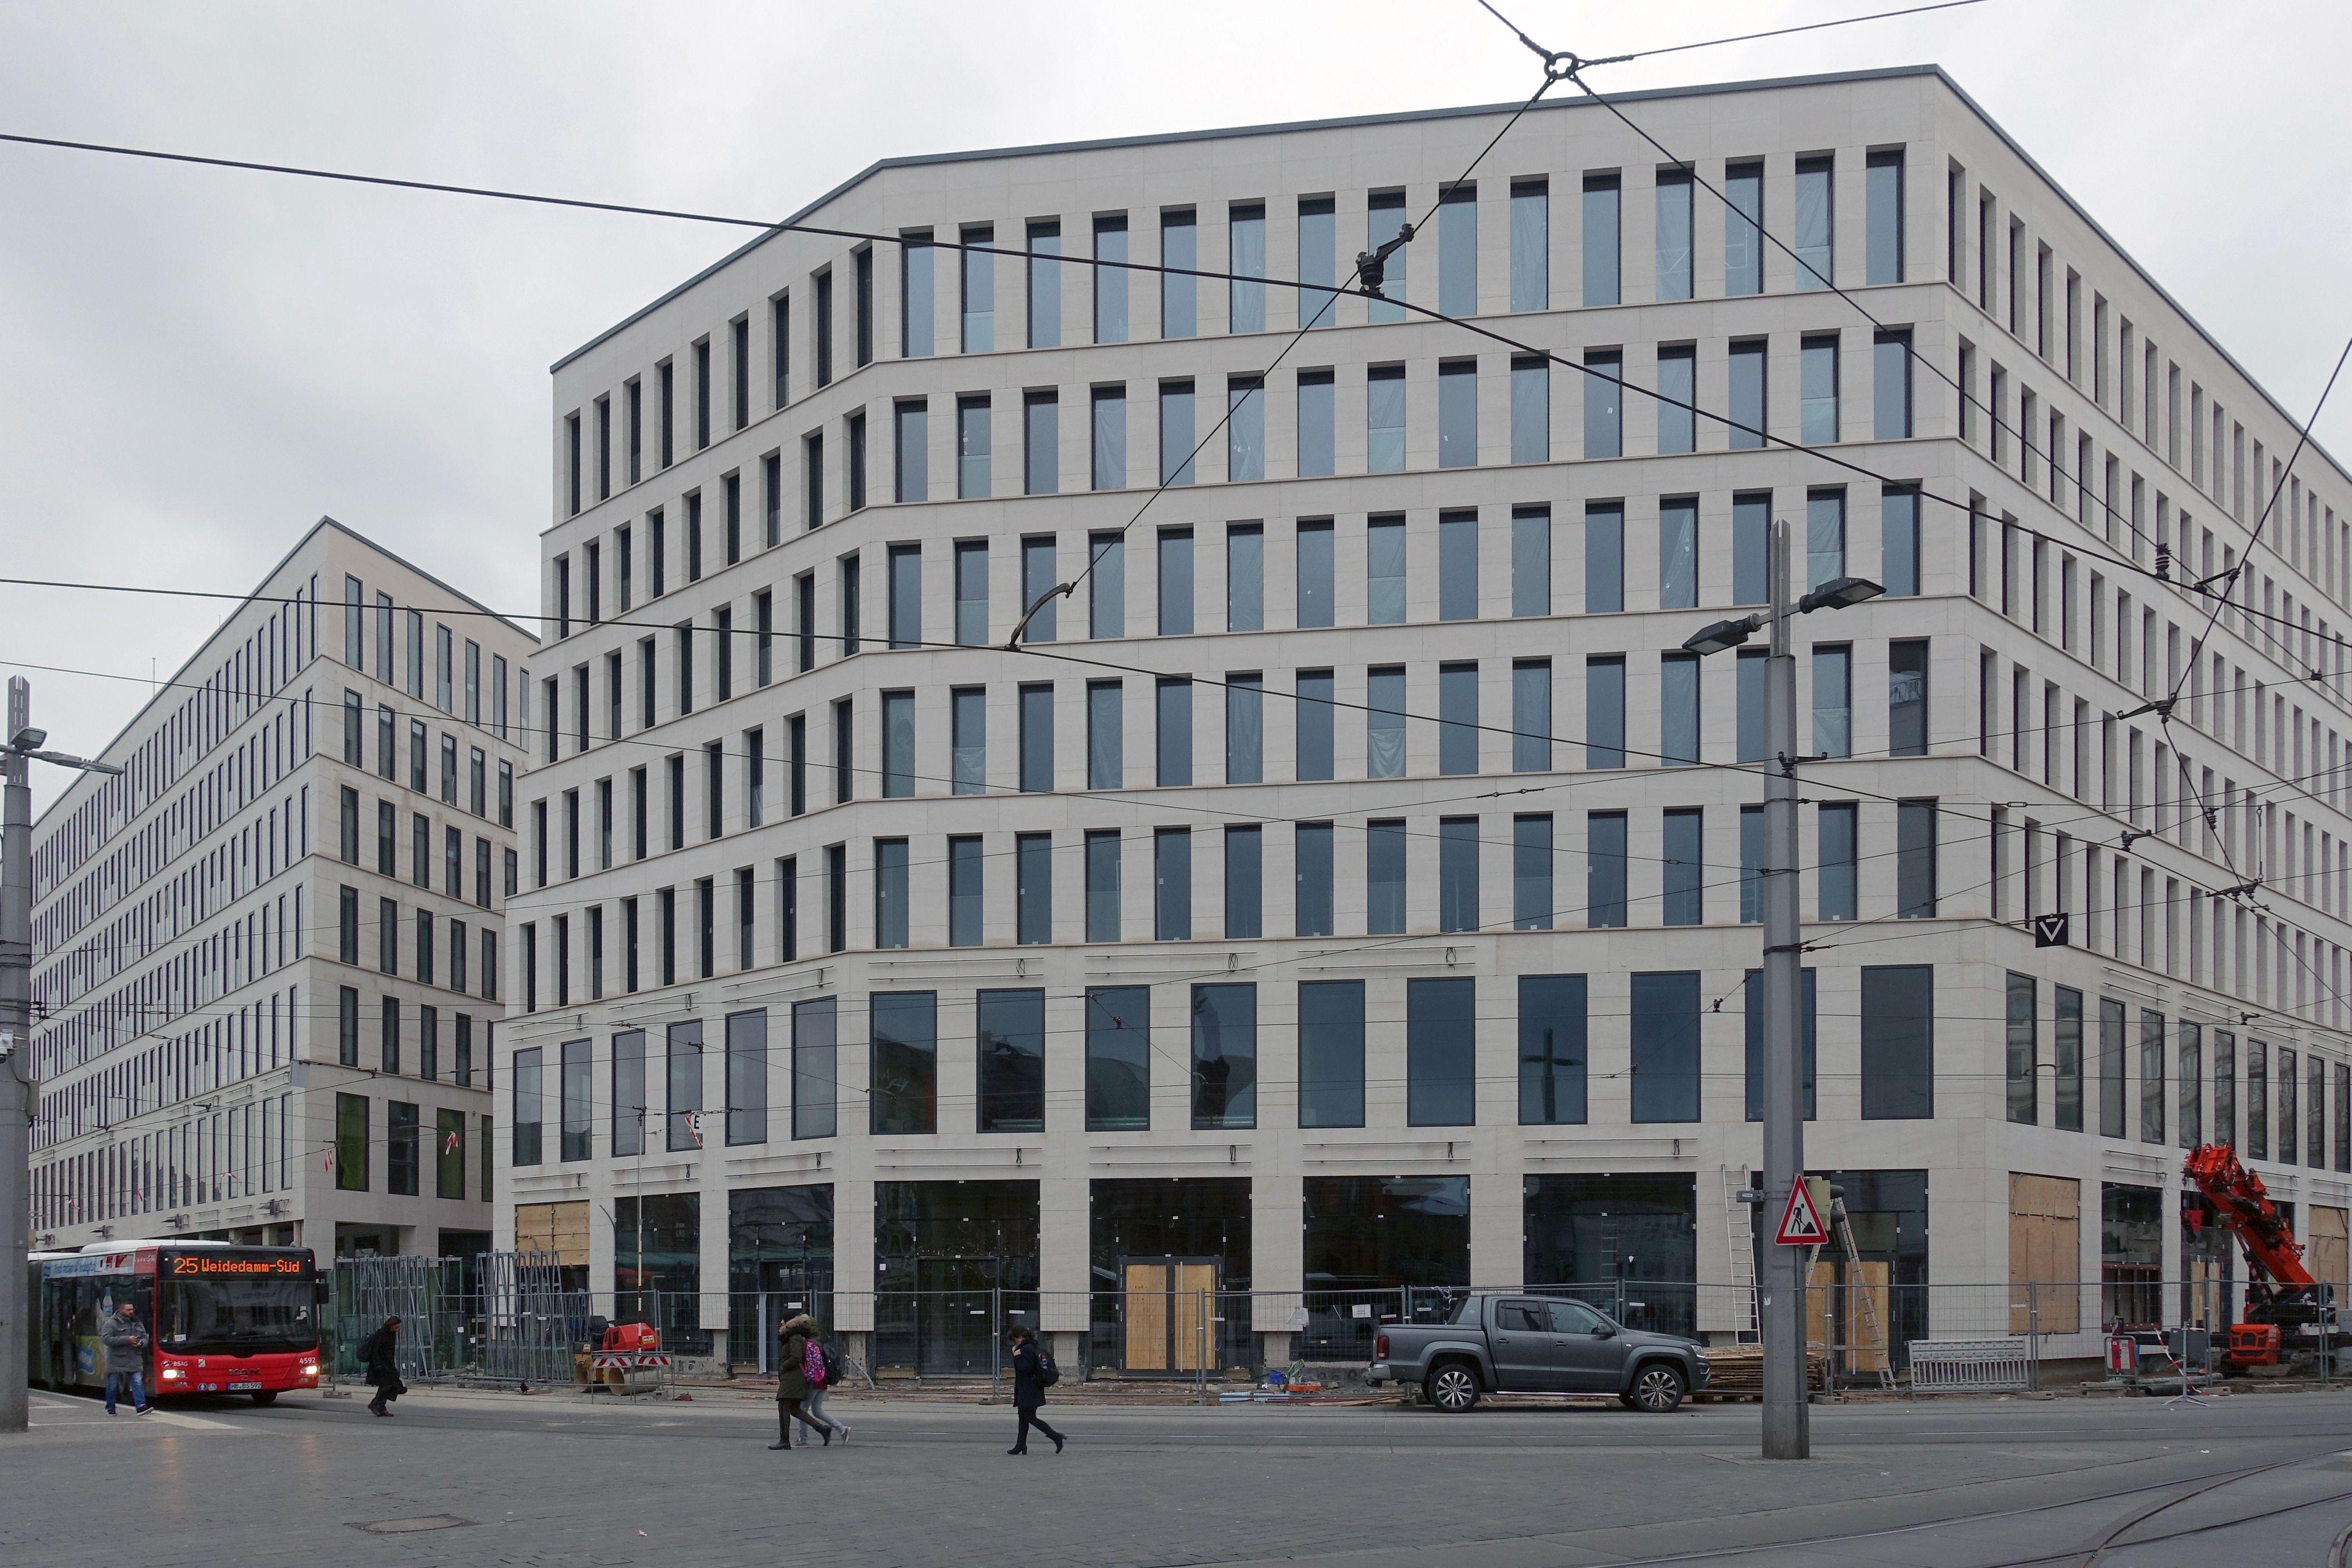 Baustelle Bahnhofsplatz 323